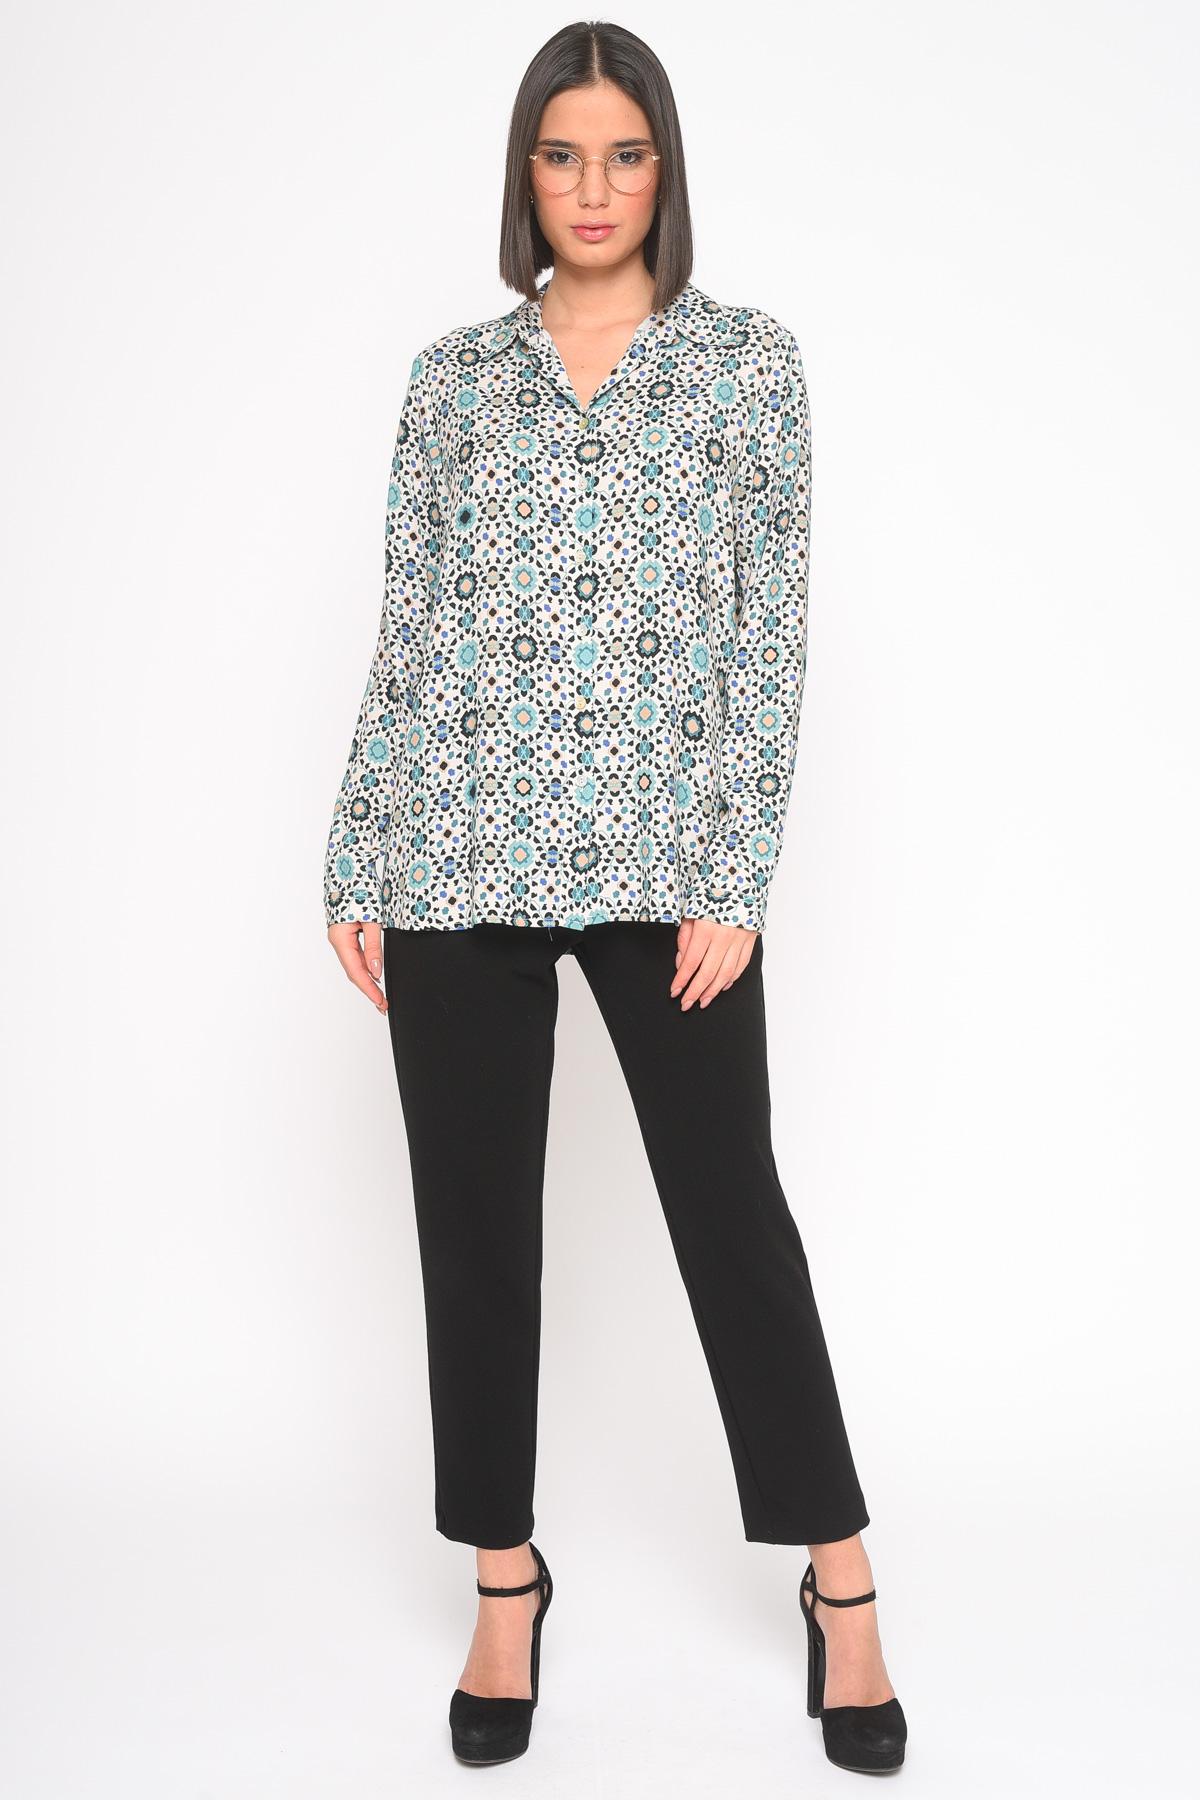 SHIRT IN FANTASY VISCOSE for women - GREEN - Paquito Pronto Moda Shop Online